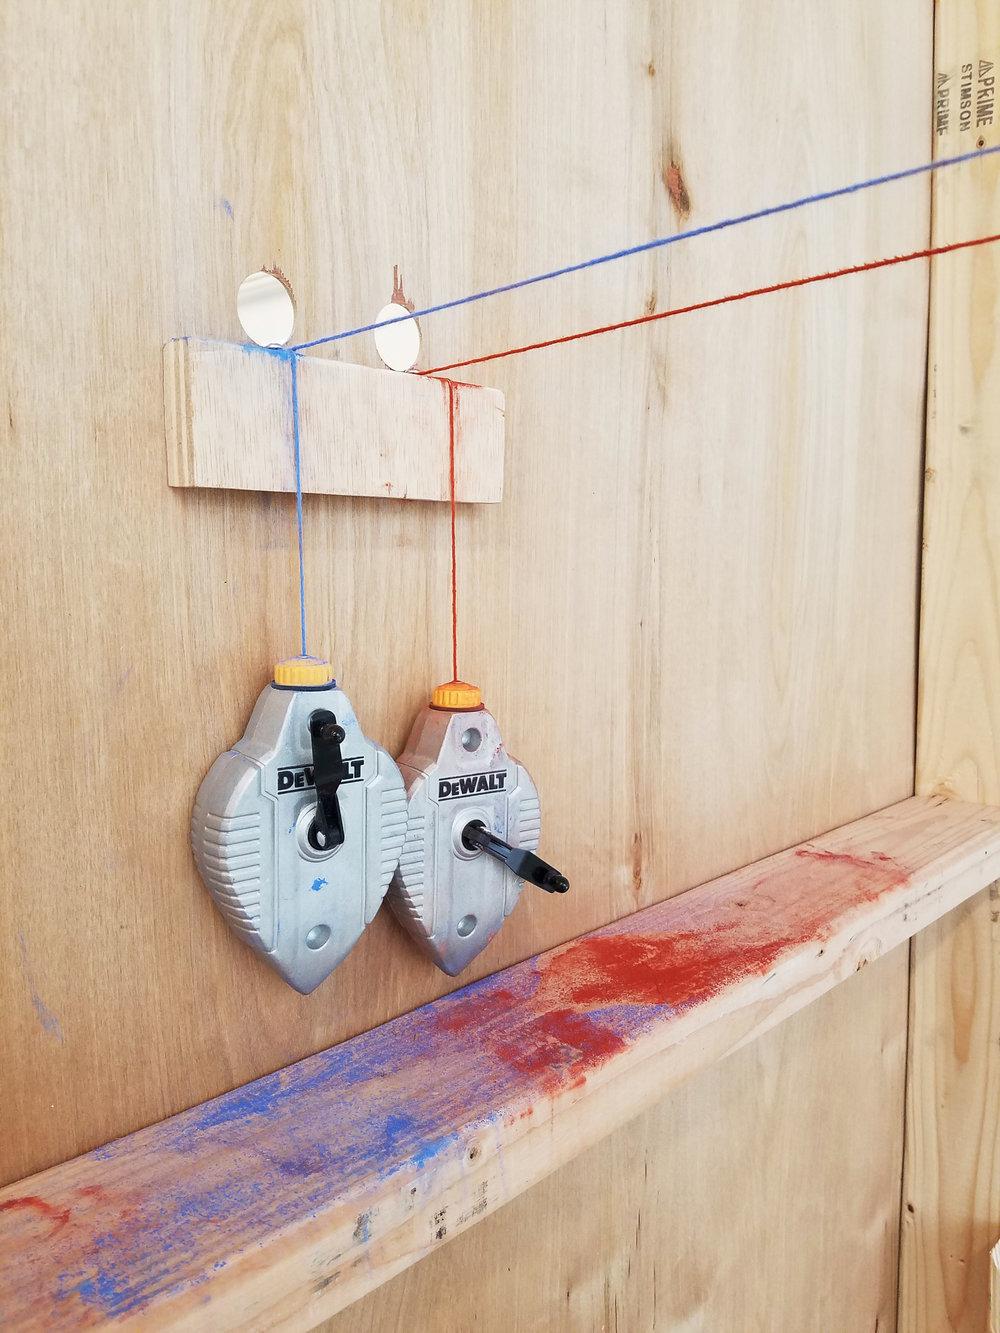 "Parallax 8: After Wells  2×4s, plywood, paint, chalk line 2017 96"" × 48""× 24"" Derek Frankhouser"